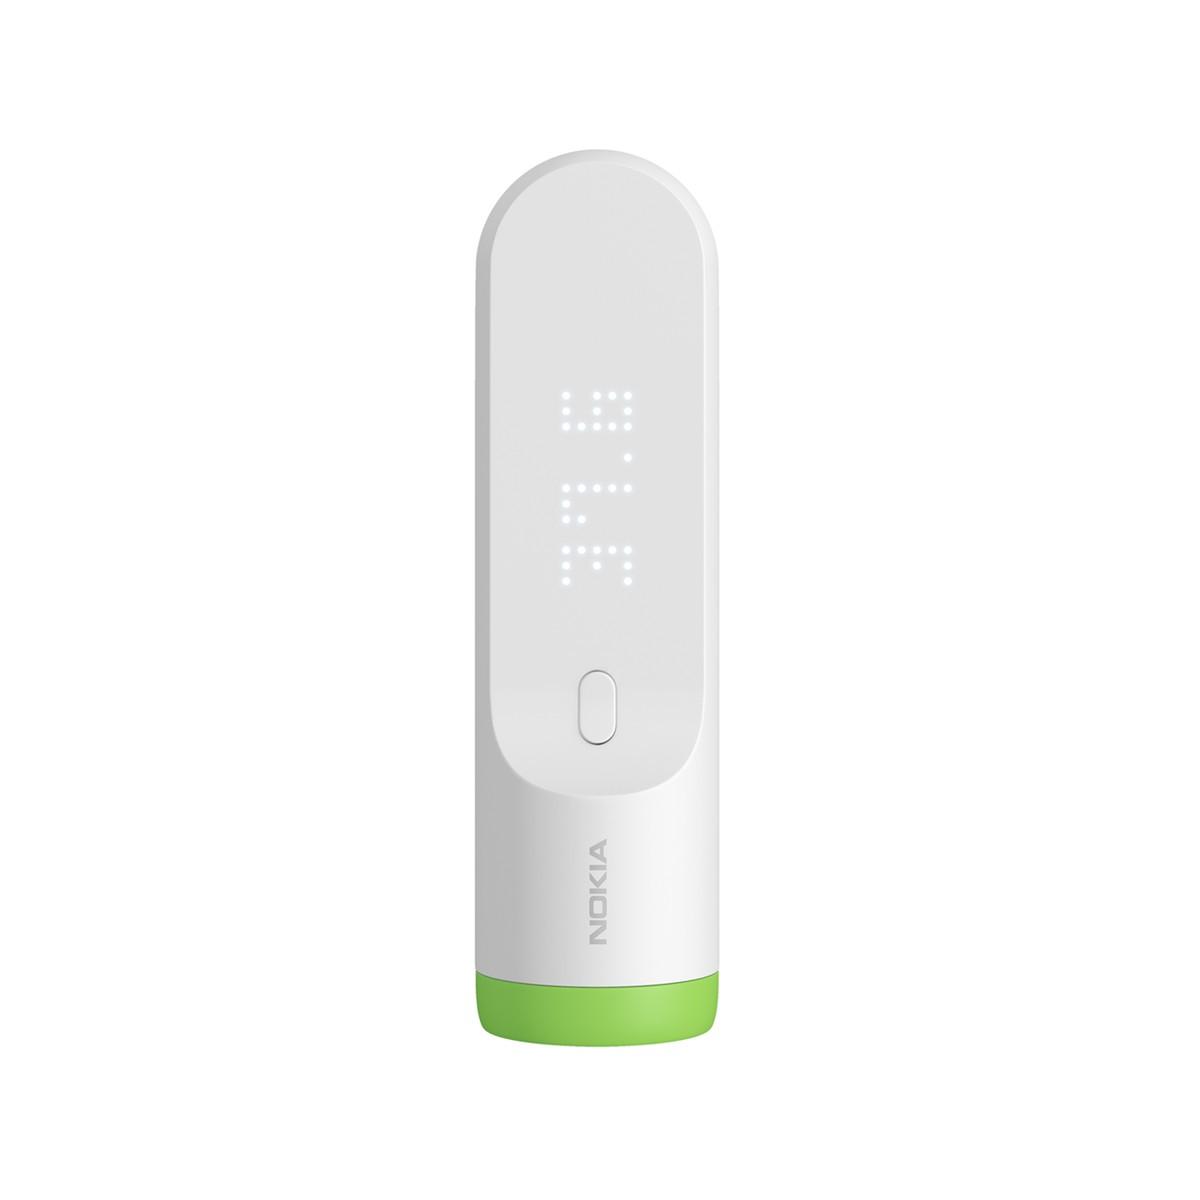 Nokia Thermo - tělesný teploměr